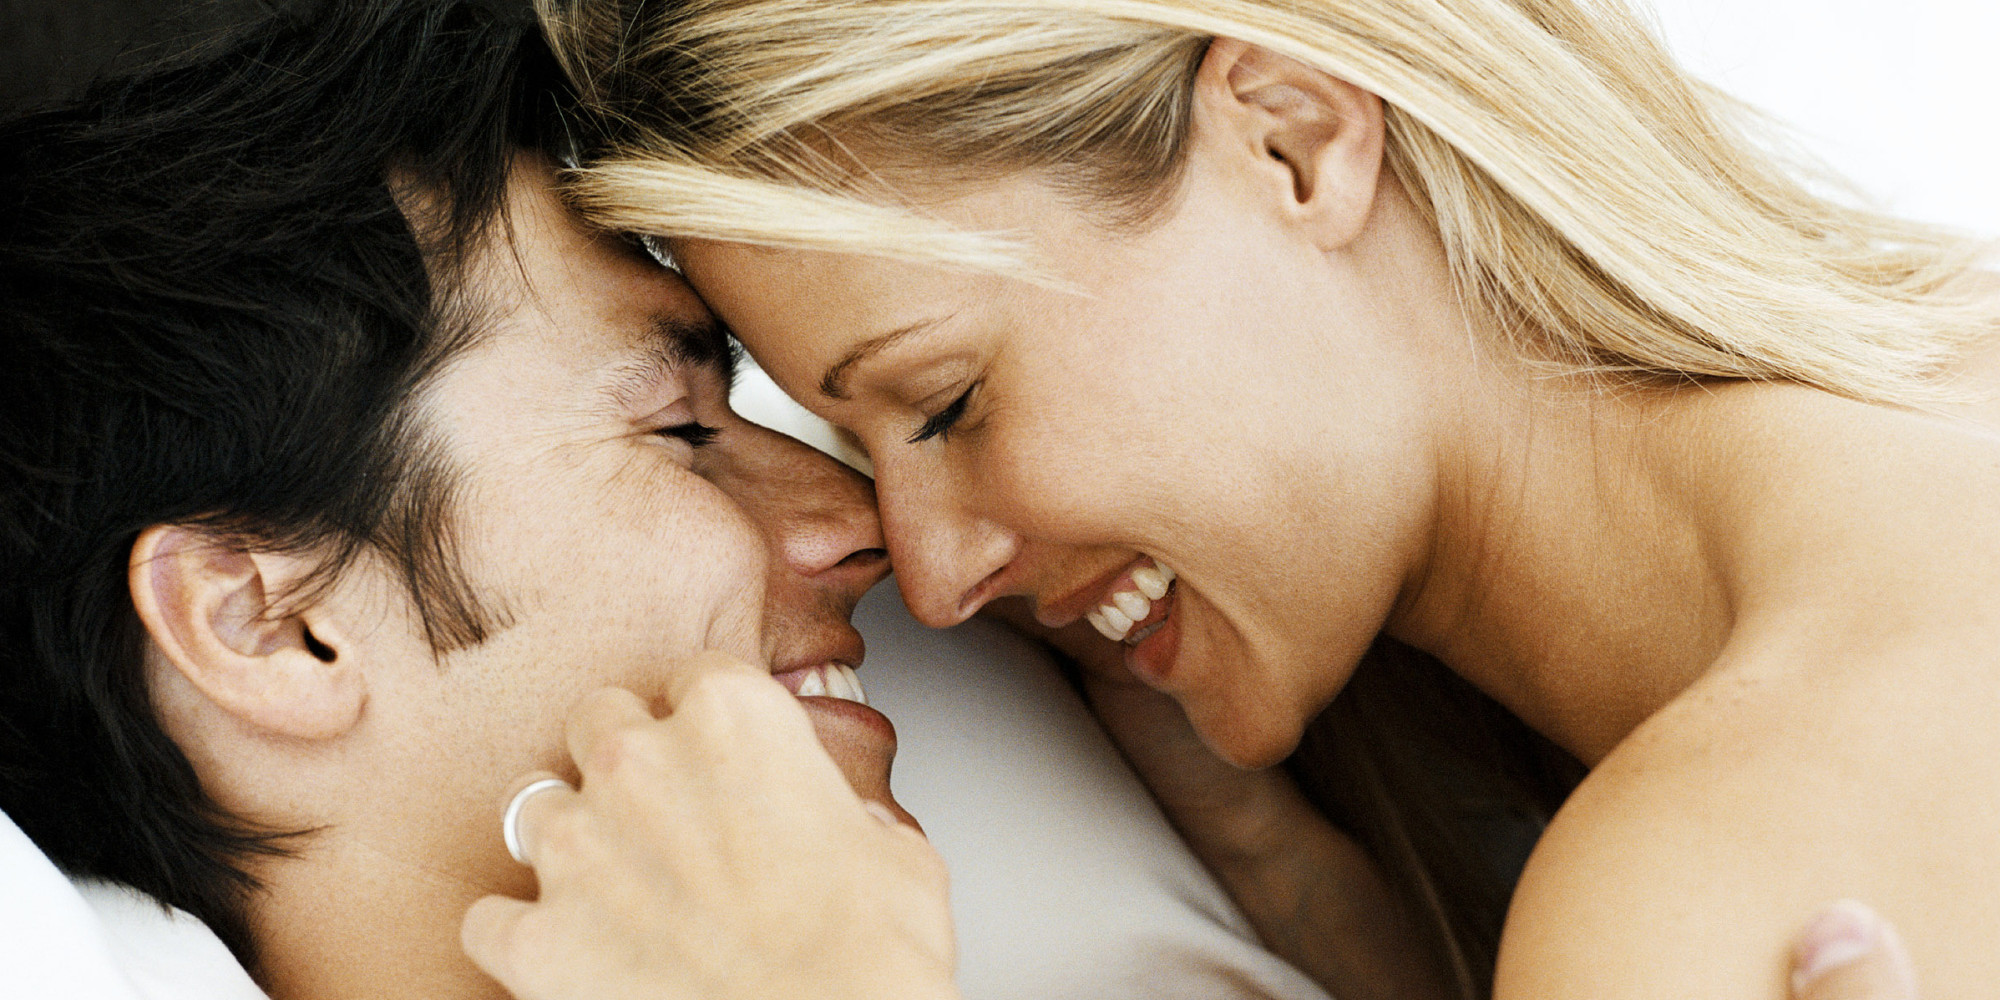 ghana free dating site